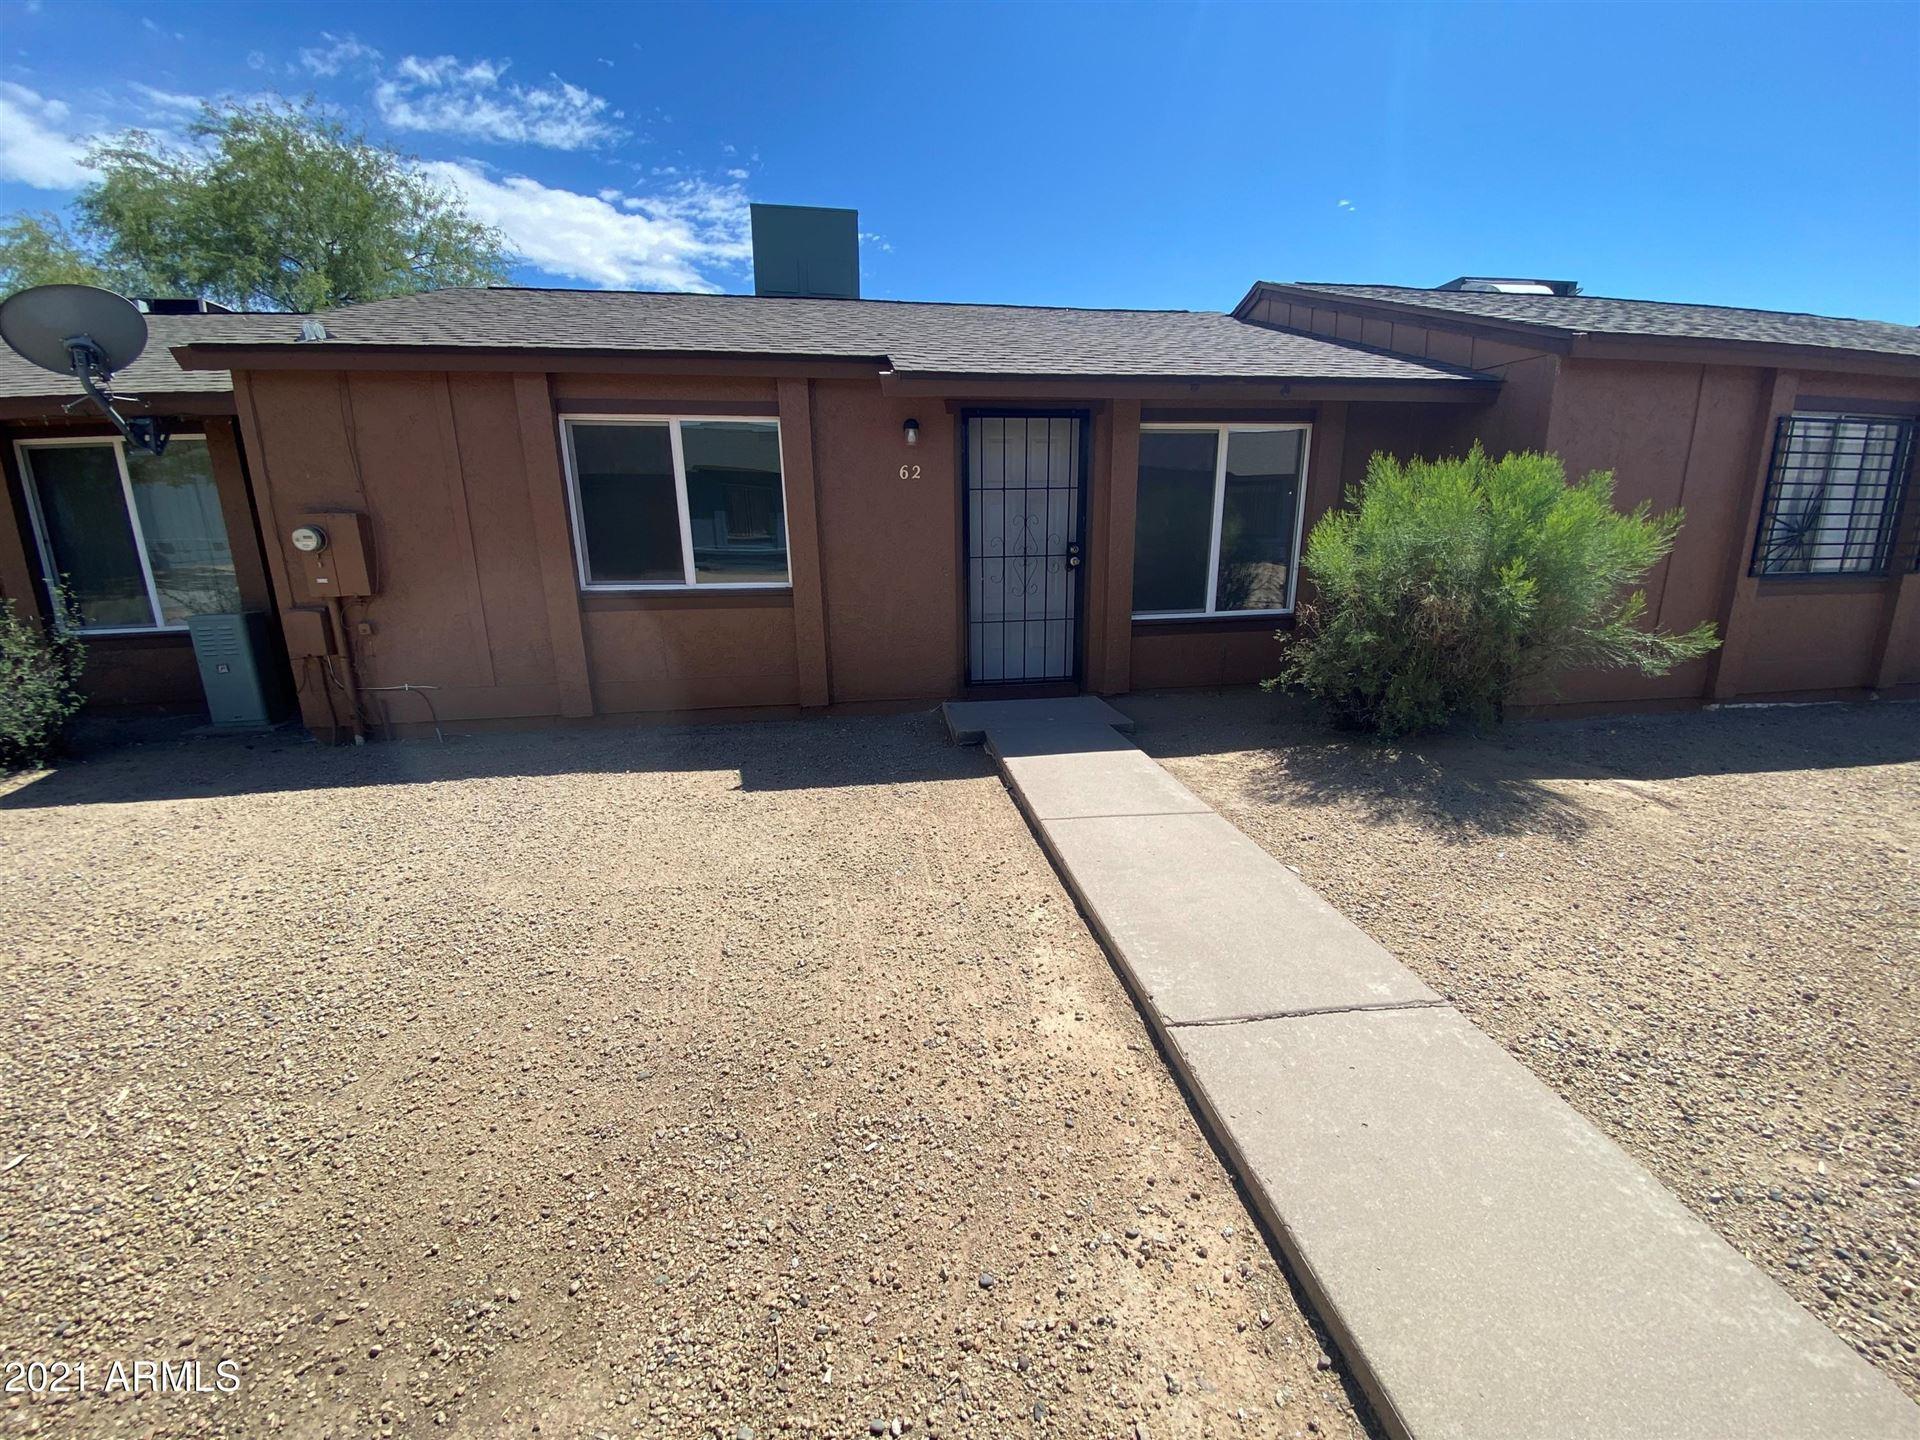 3646 N 67TH Avenue #62, Phoenix, AZ 85033 - MLS#: 6229200